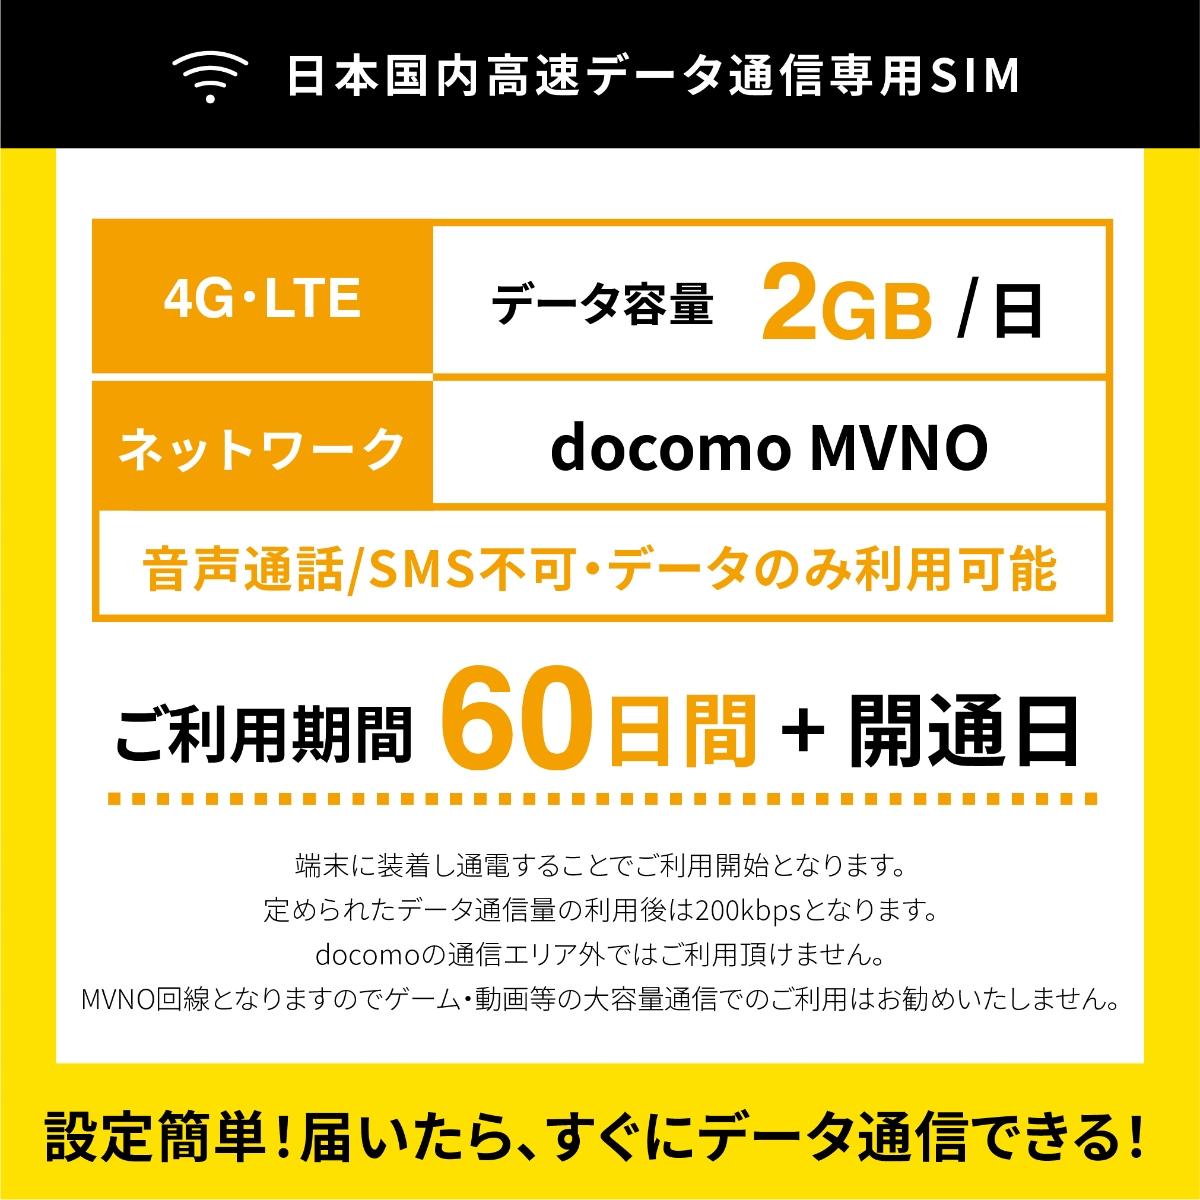 日本国内データ専用SIM コミコミパック docomo MVNO回線 LTE 1日2GB 30日/60日/90日